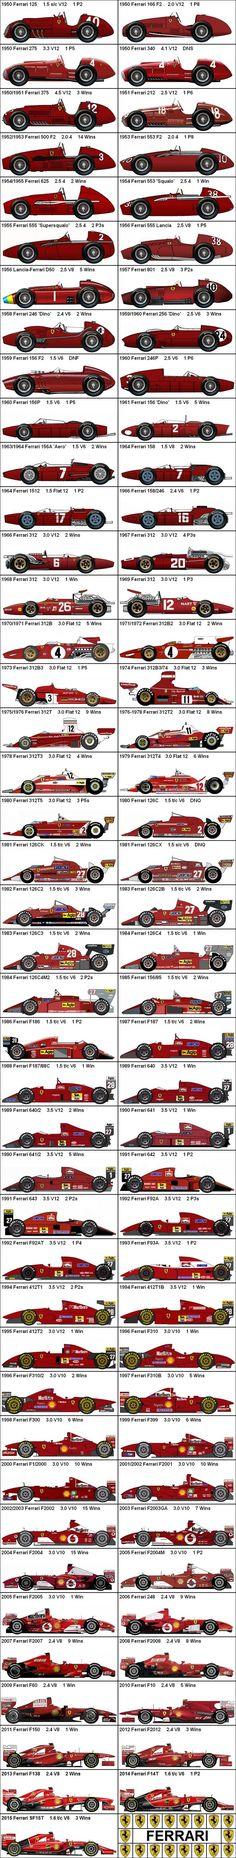 Formula One Grand Prix Ferrari 1950-2015 - https://www.luxury.guugles.com/formula-one-grand-prix-ferrari-1950-2015/